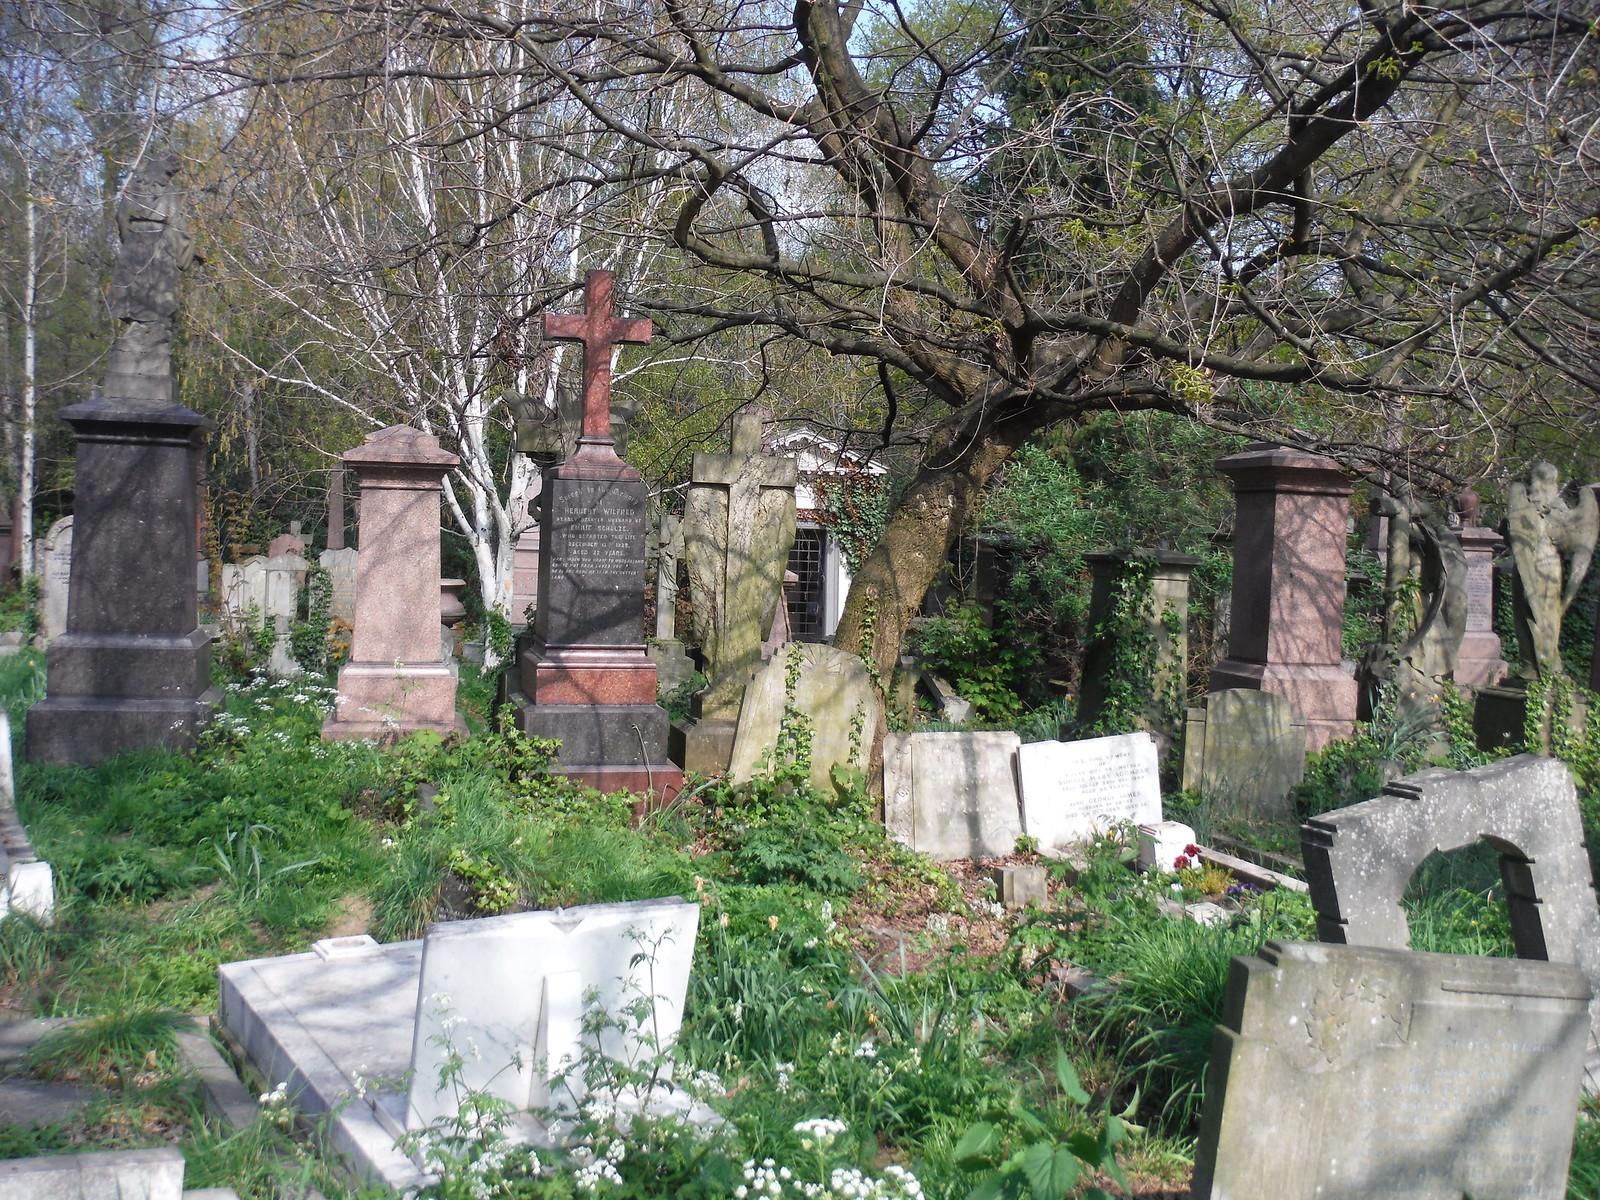 Abney Park Cemetery (I) SWC Short Walk 26 - Woodberry Wetlands (Stoke Newington Reservoirs)